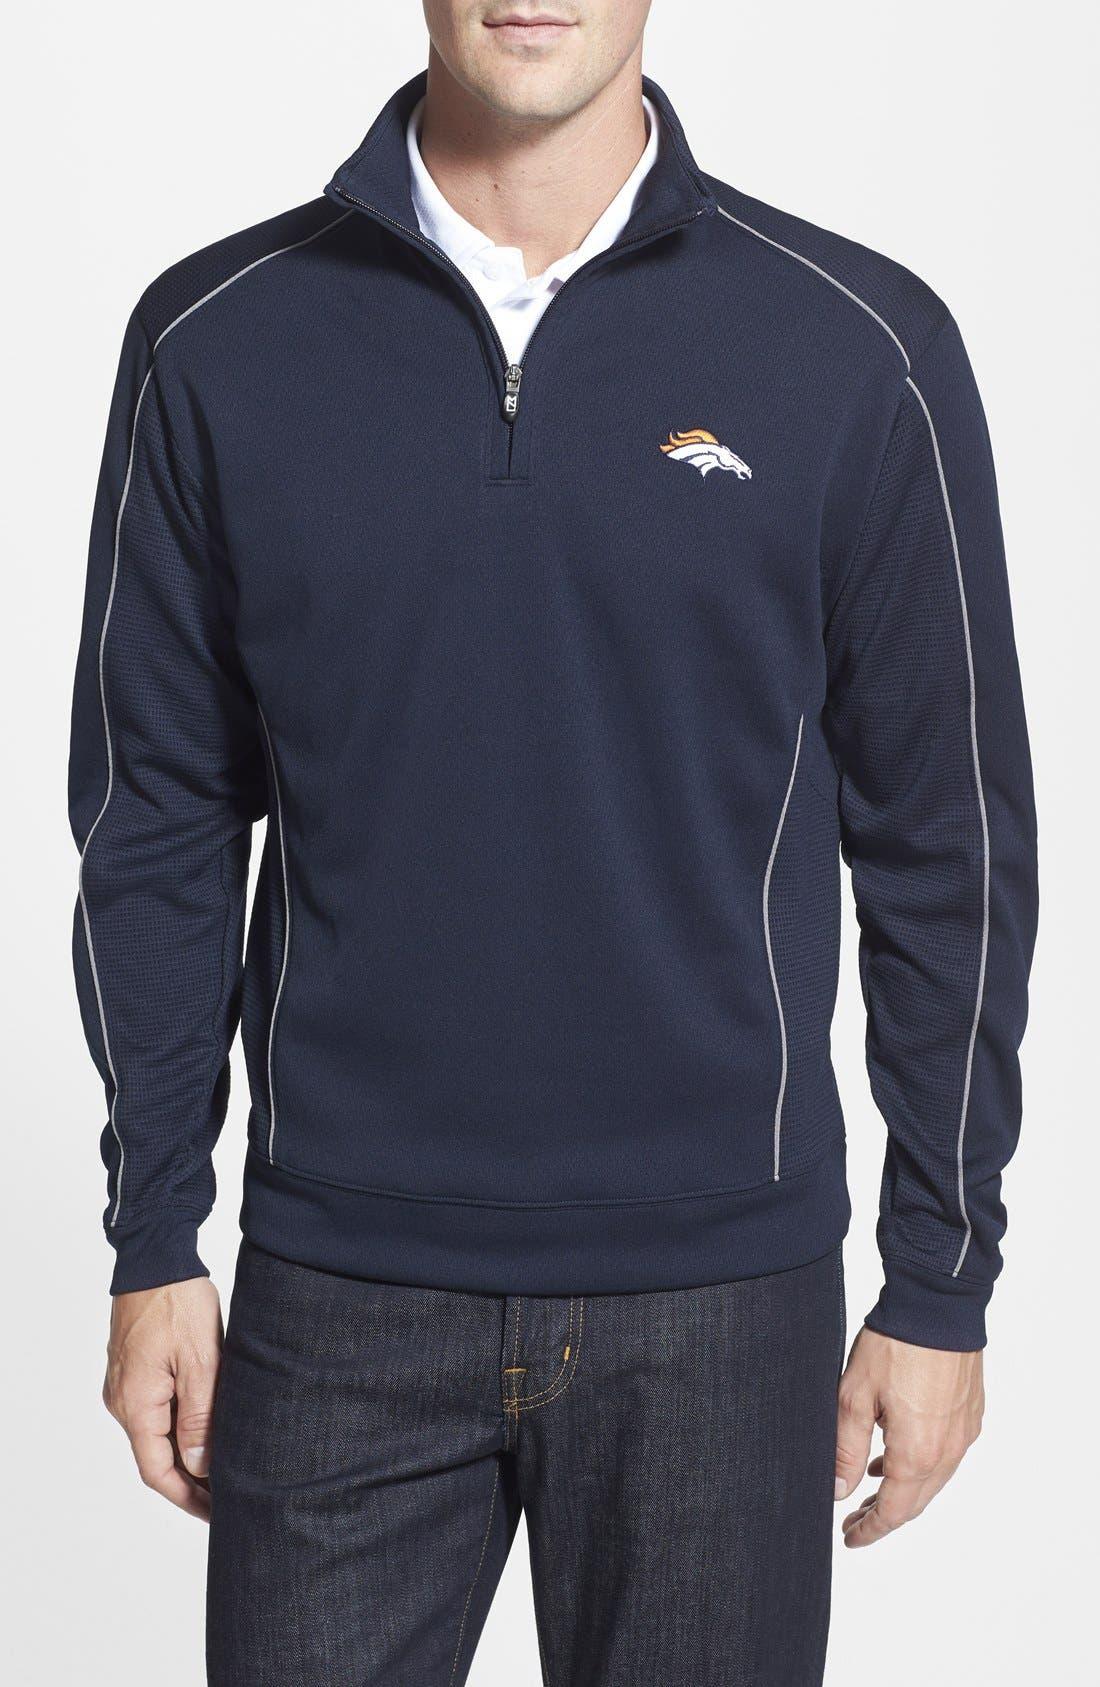 Denver Broncos - Edge DryTec Moisture Wicking Half Zip Pullover,                         Main,                         color, Navy Blue